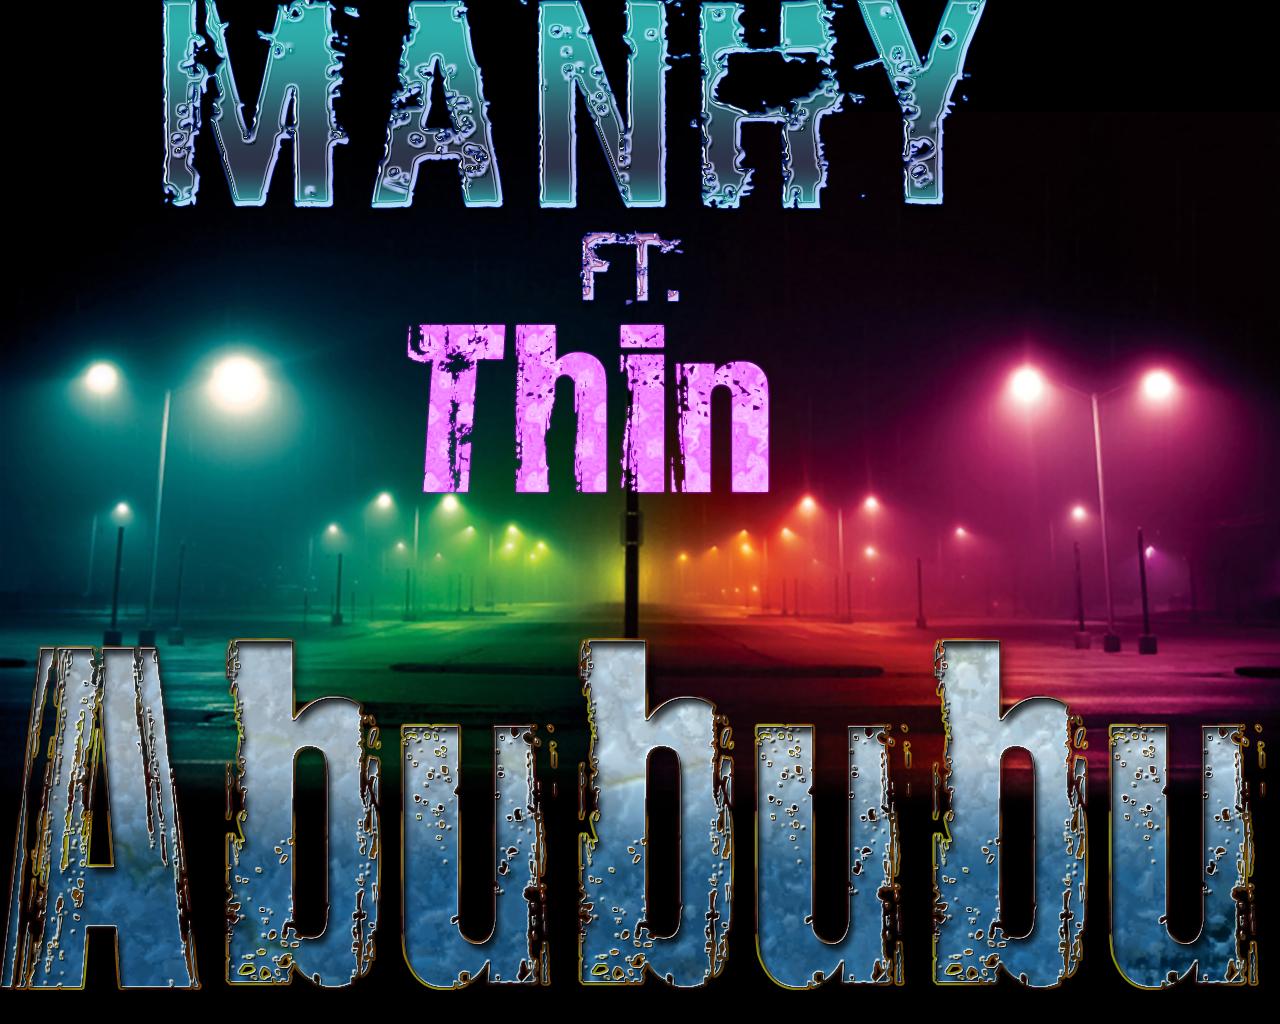 http://1.bp.blogspot.com/-pwteOmjNjsU/Tm5C7obcHYI/AAAAAAAAAbM/JVwhyYPem5o/s1600/Manhy+ft+Thin+-+Abububu.jpg